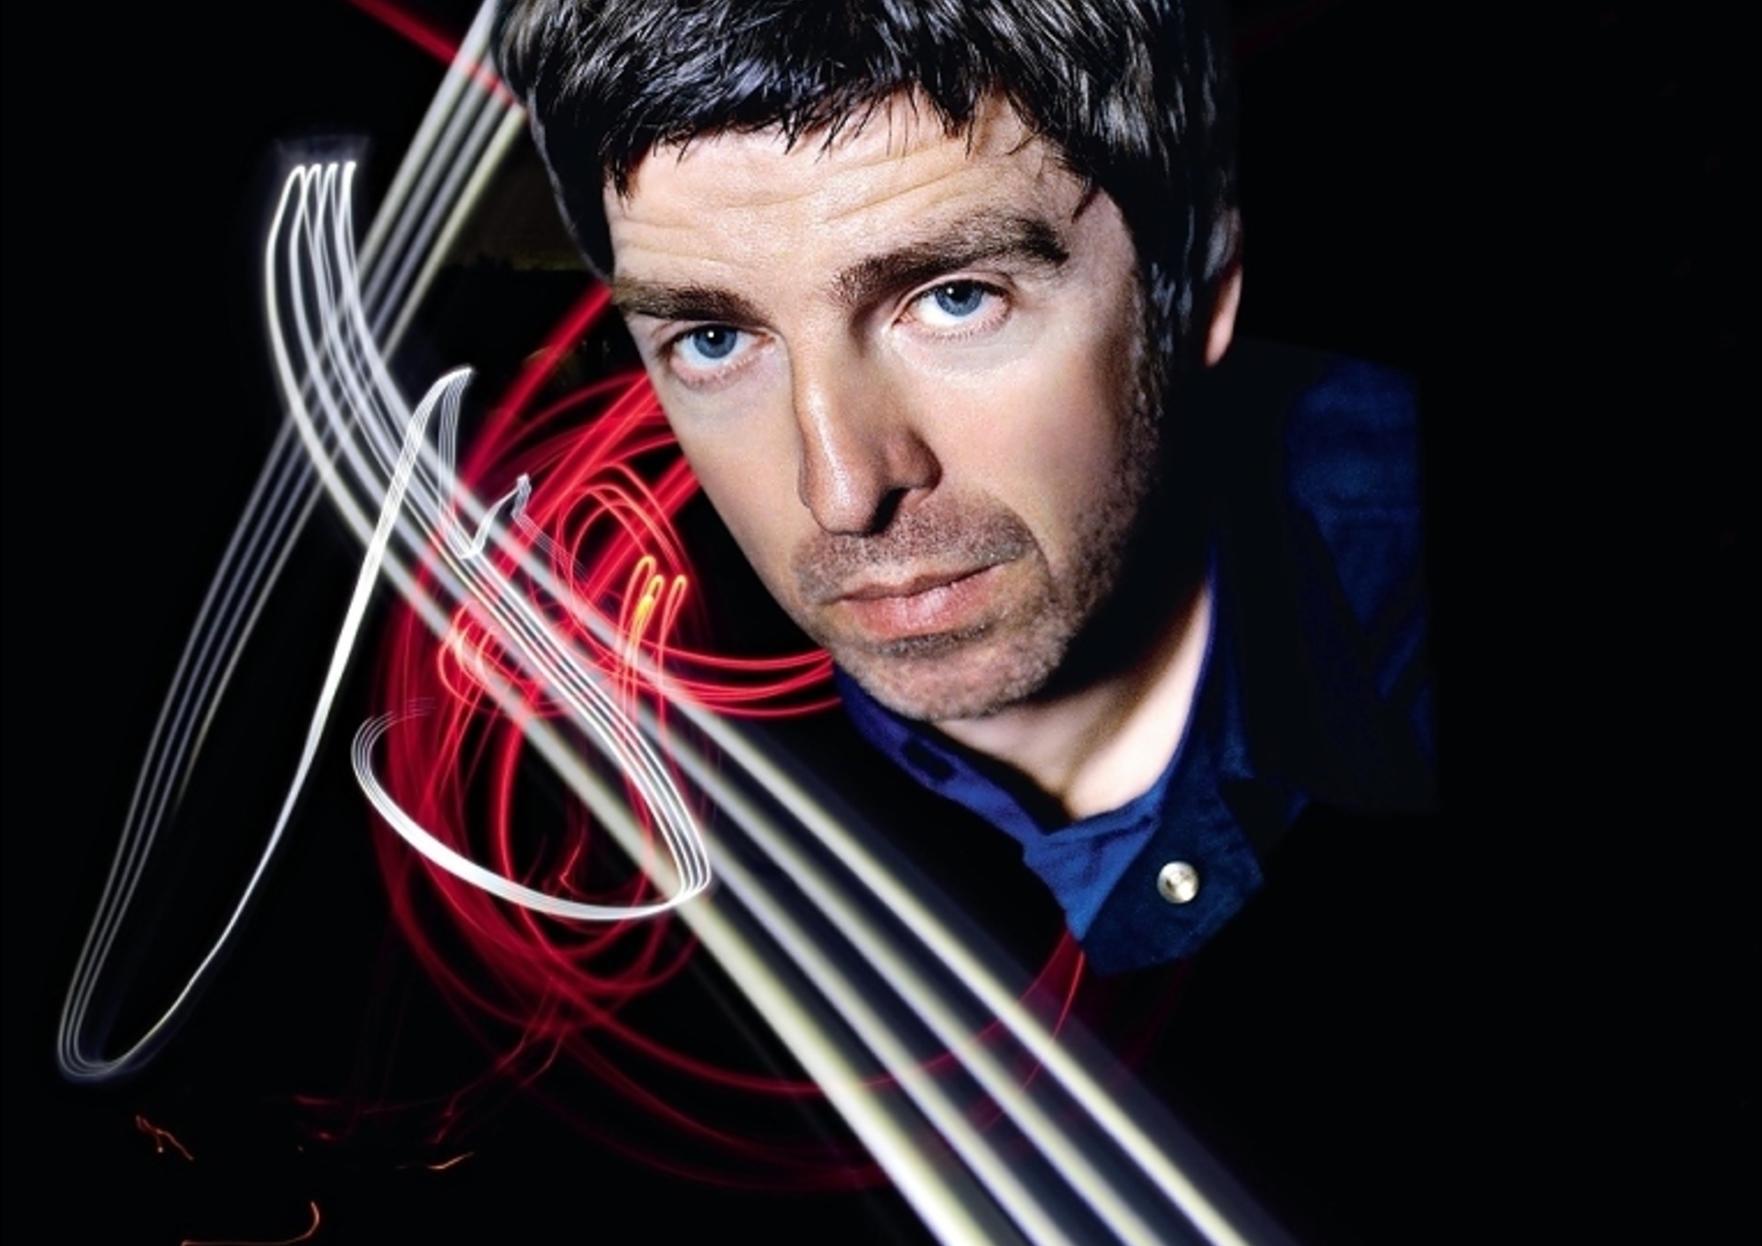 Noel Gallagher/Damon Albarn/Graham Coxon + Gruff Rhys